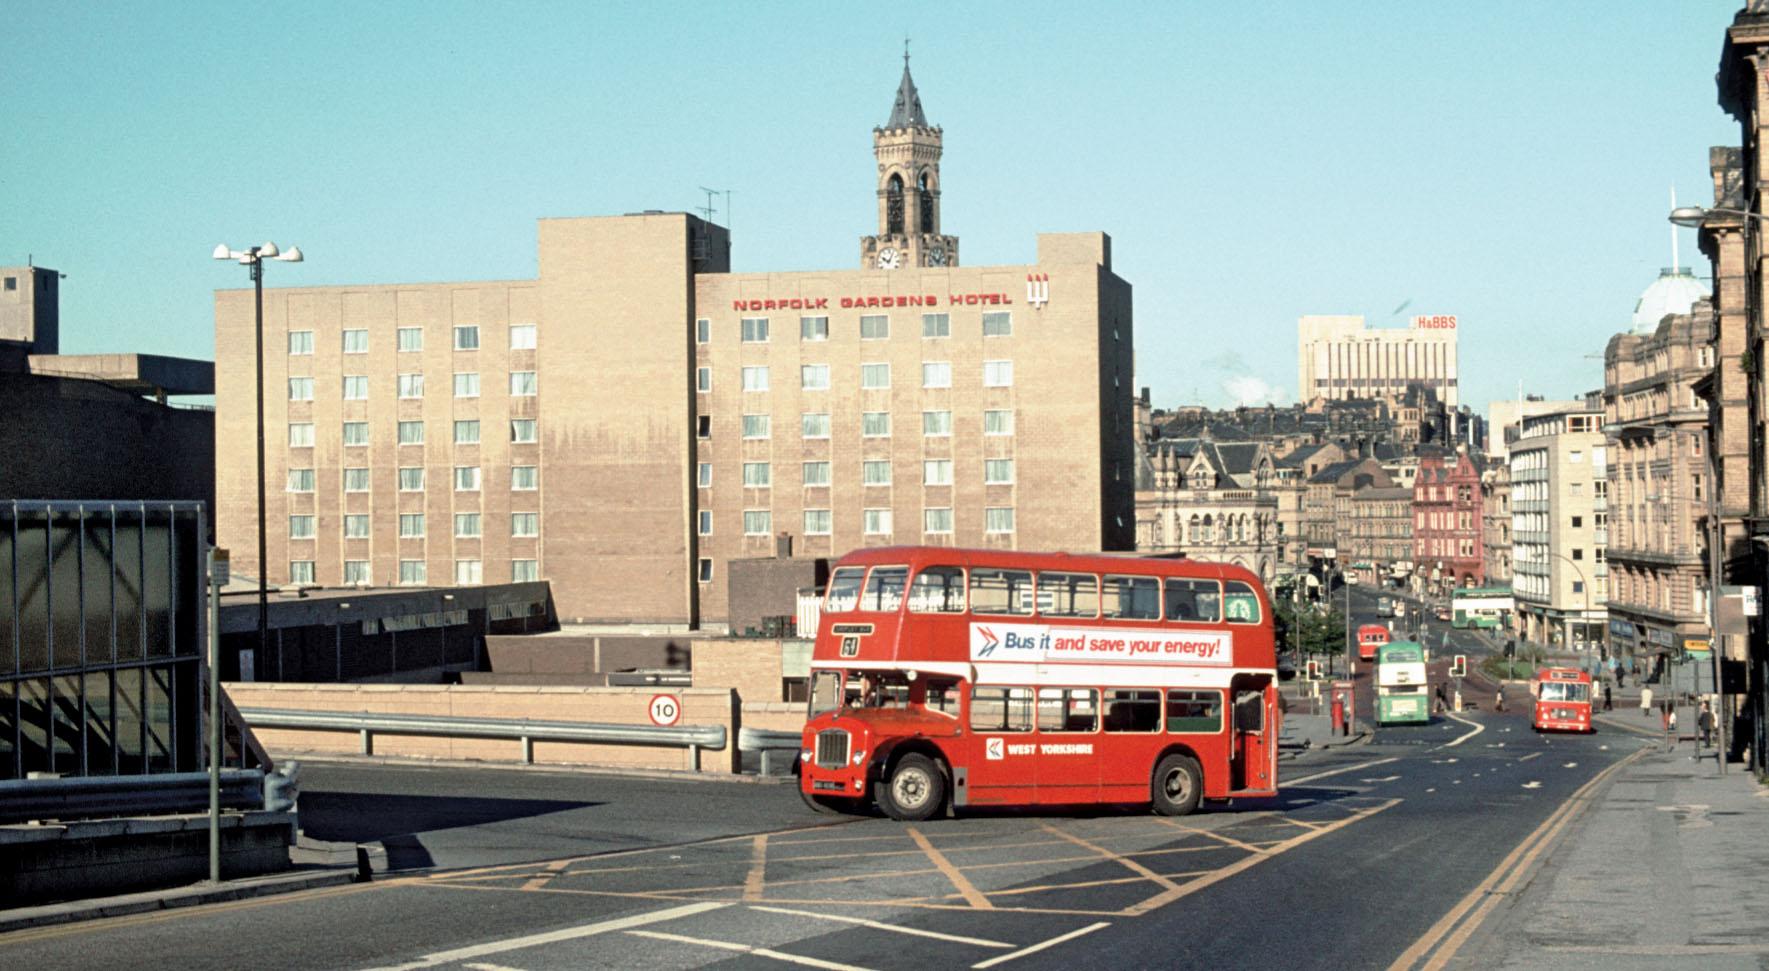 Turning into Bradford Interchange